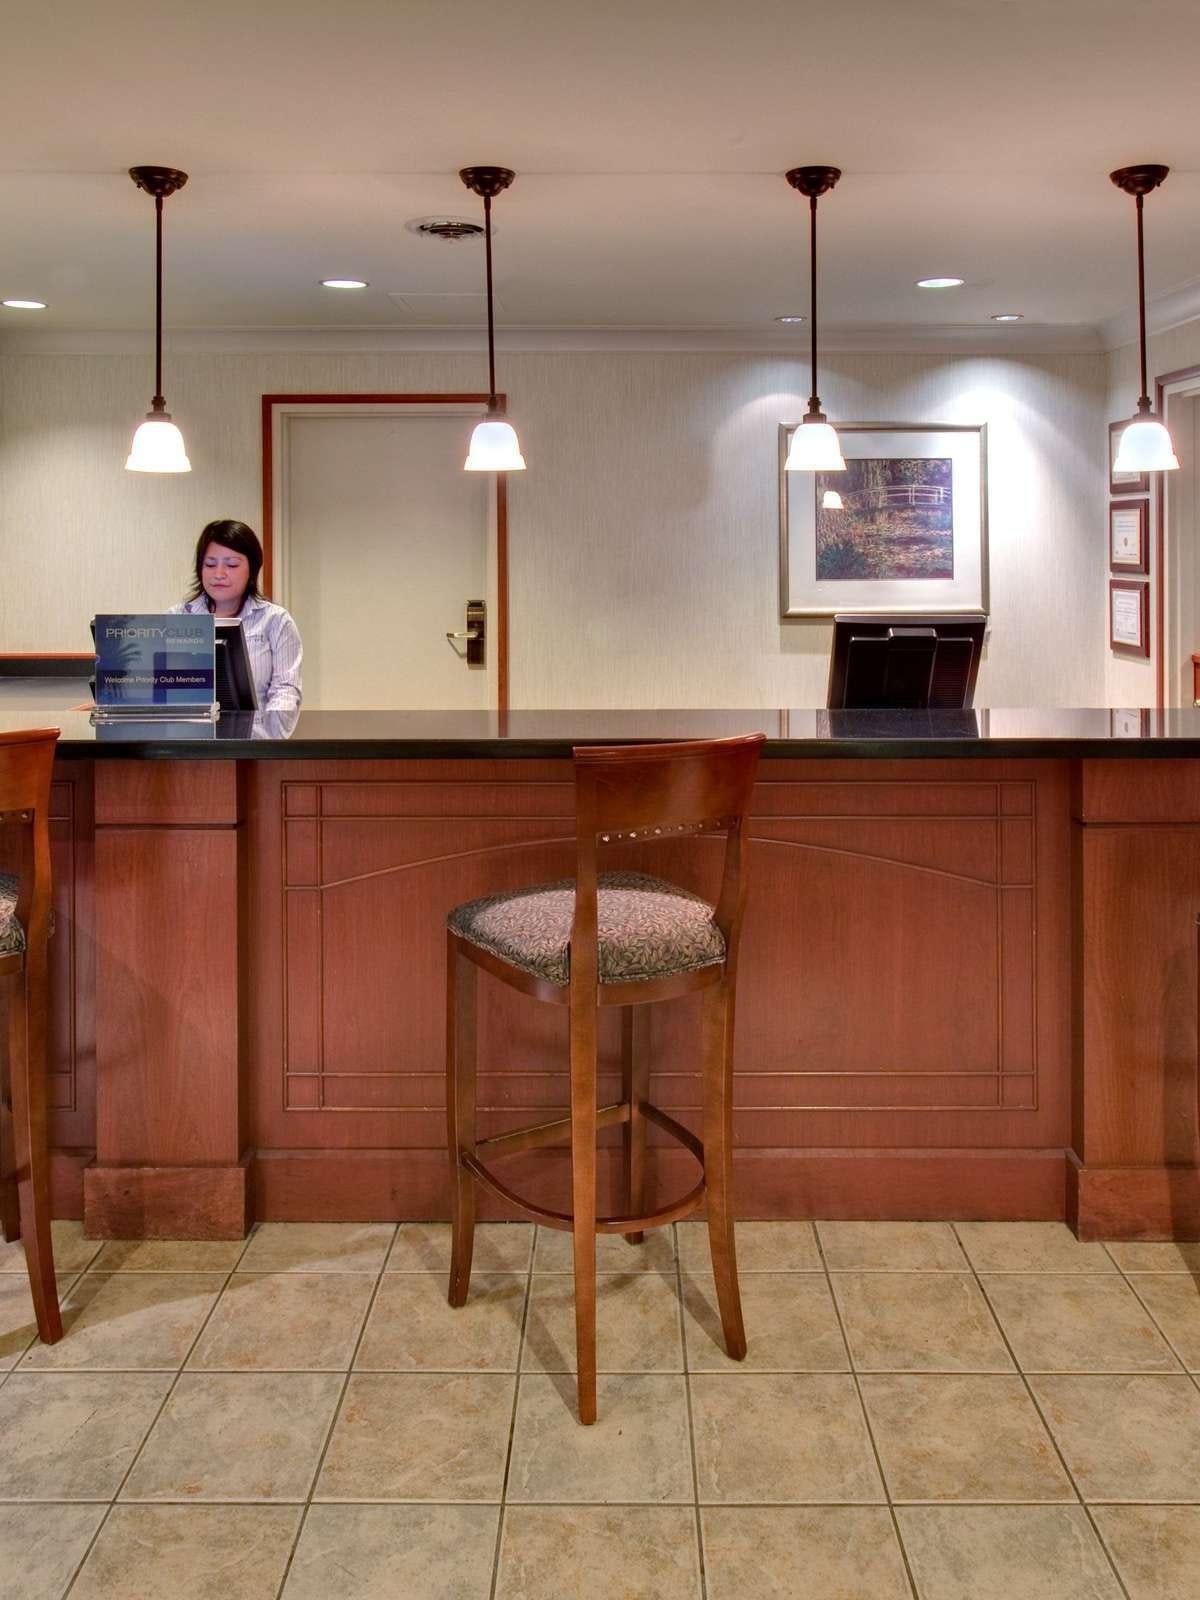 Staybridge Suites Chicago Oakbrook Terrace